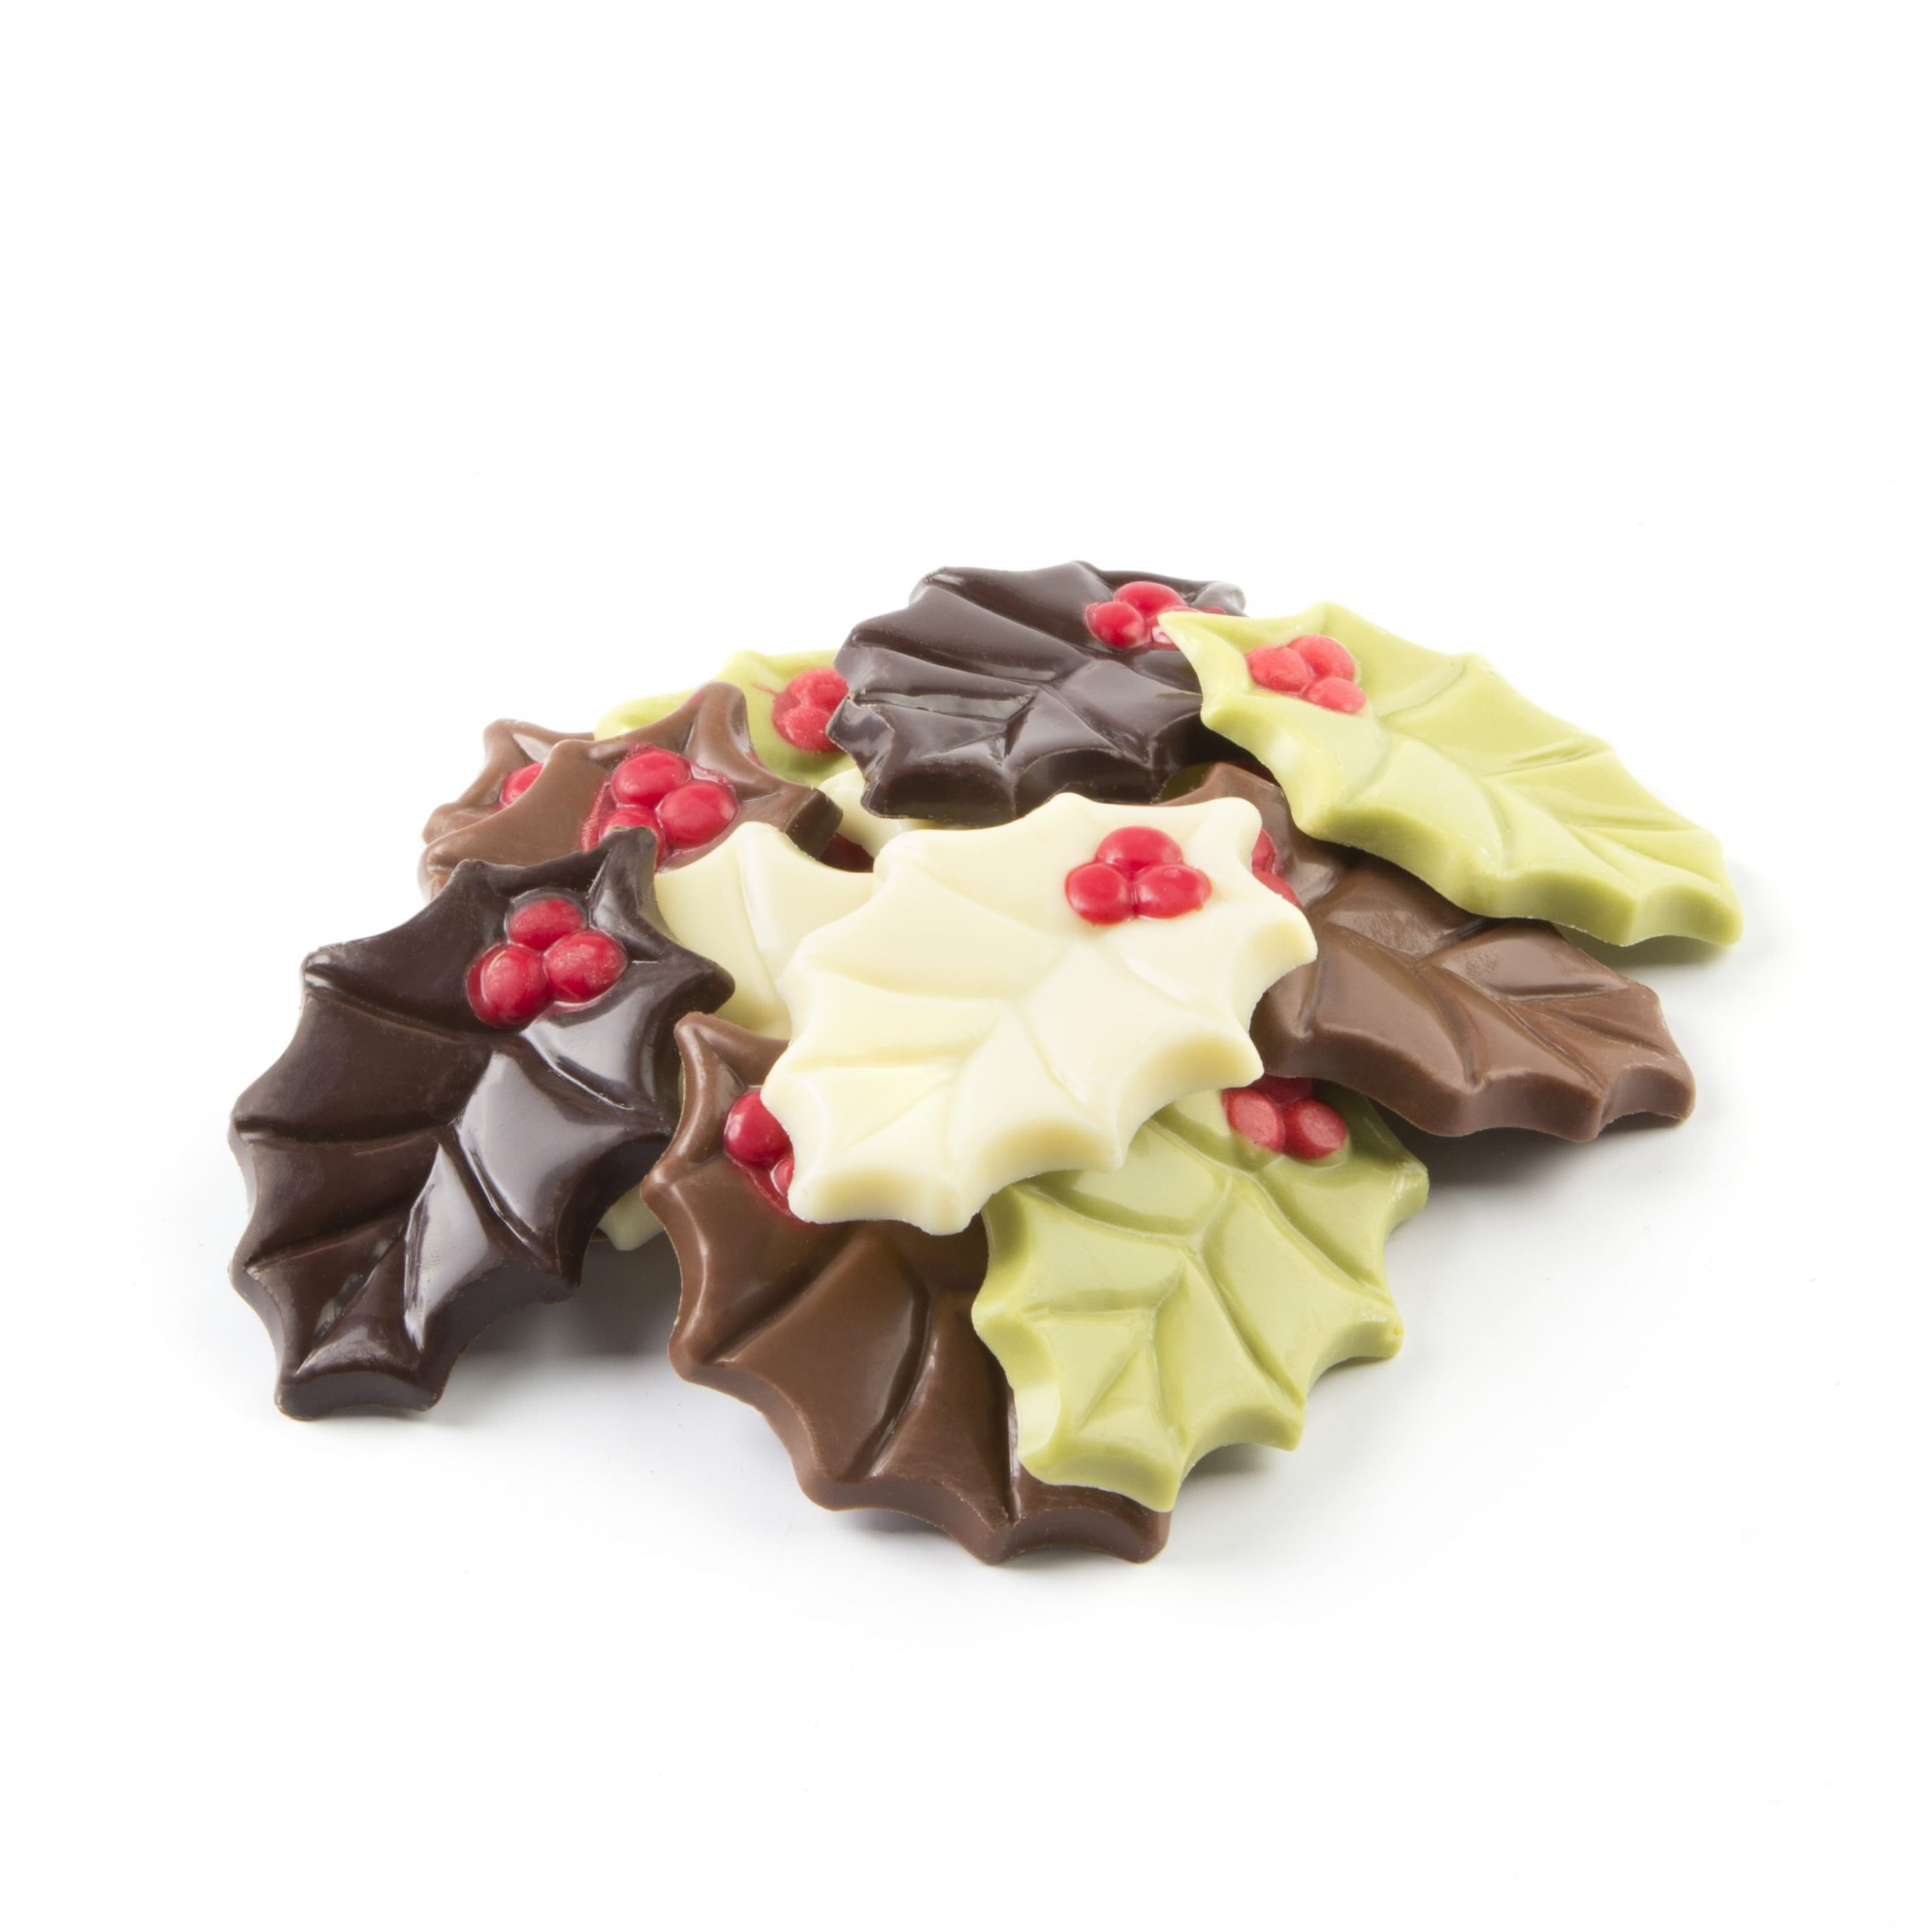 Kerst Chocolade - Hulsblaadjes